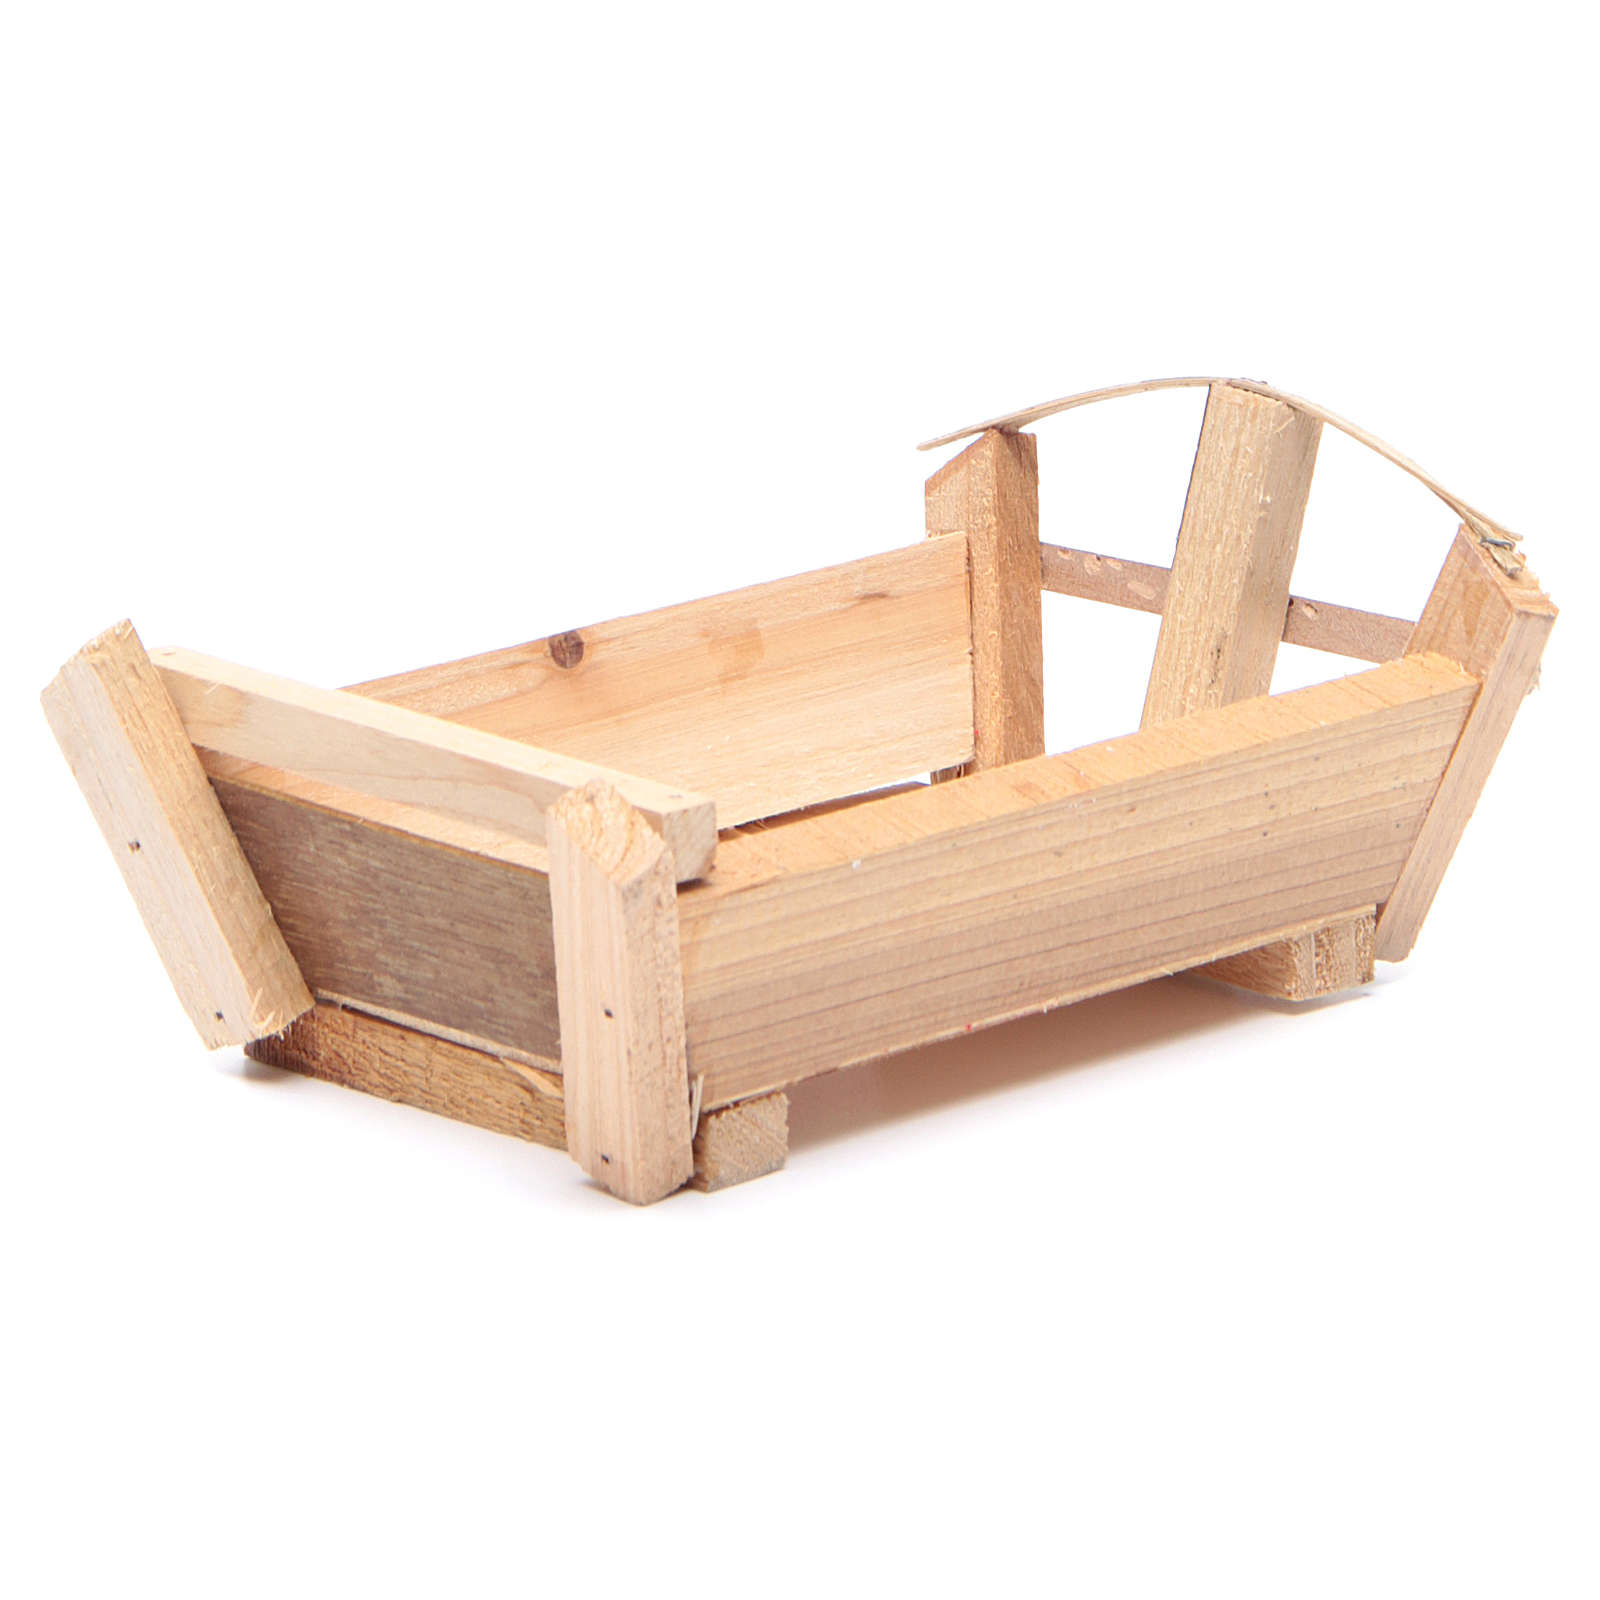 Cuna de madera 9x18x12 cm para Niño Jesús 3